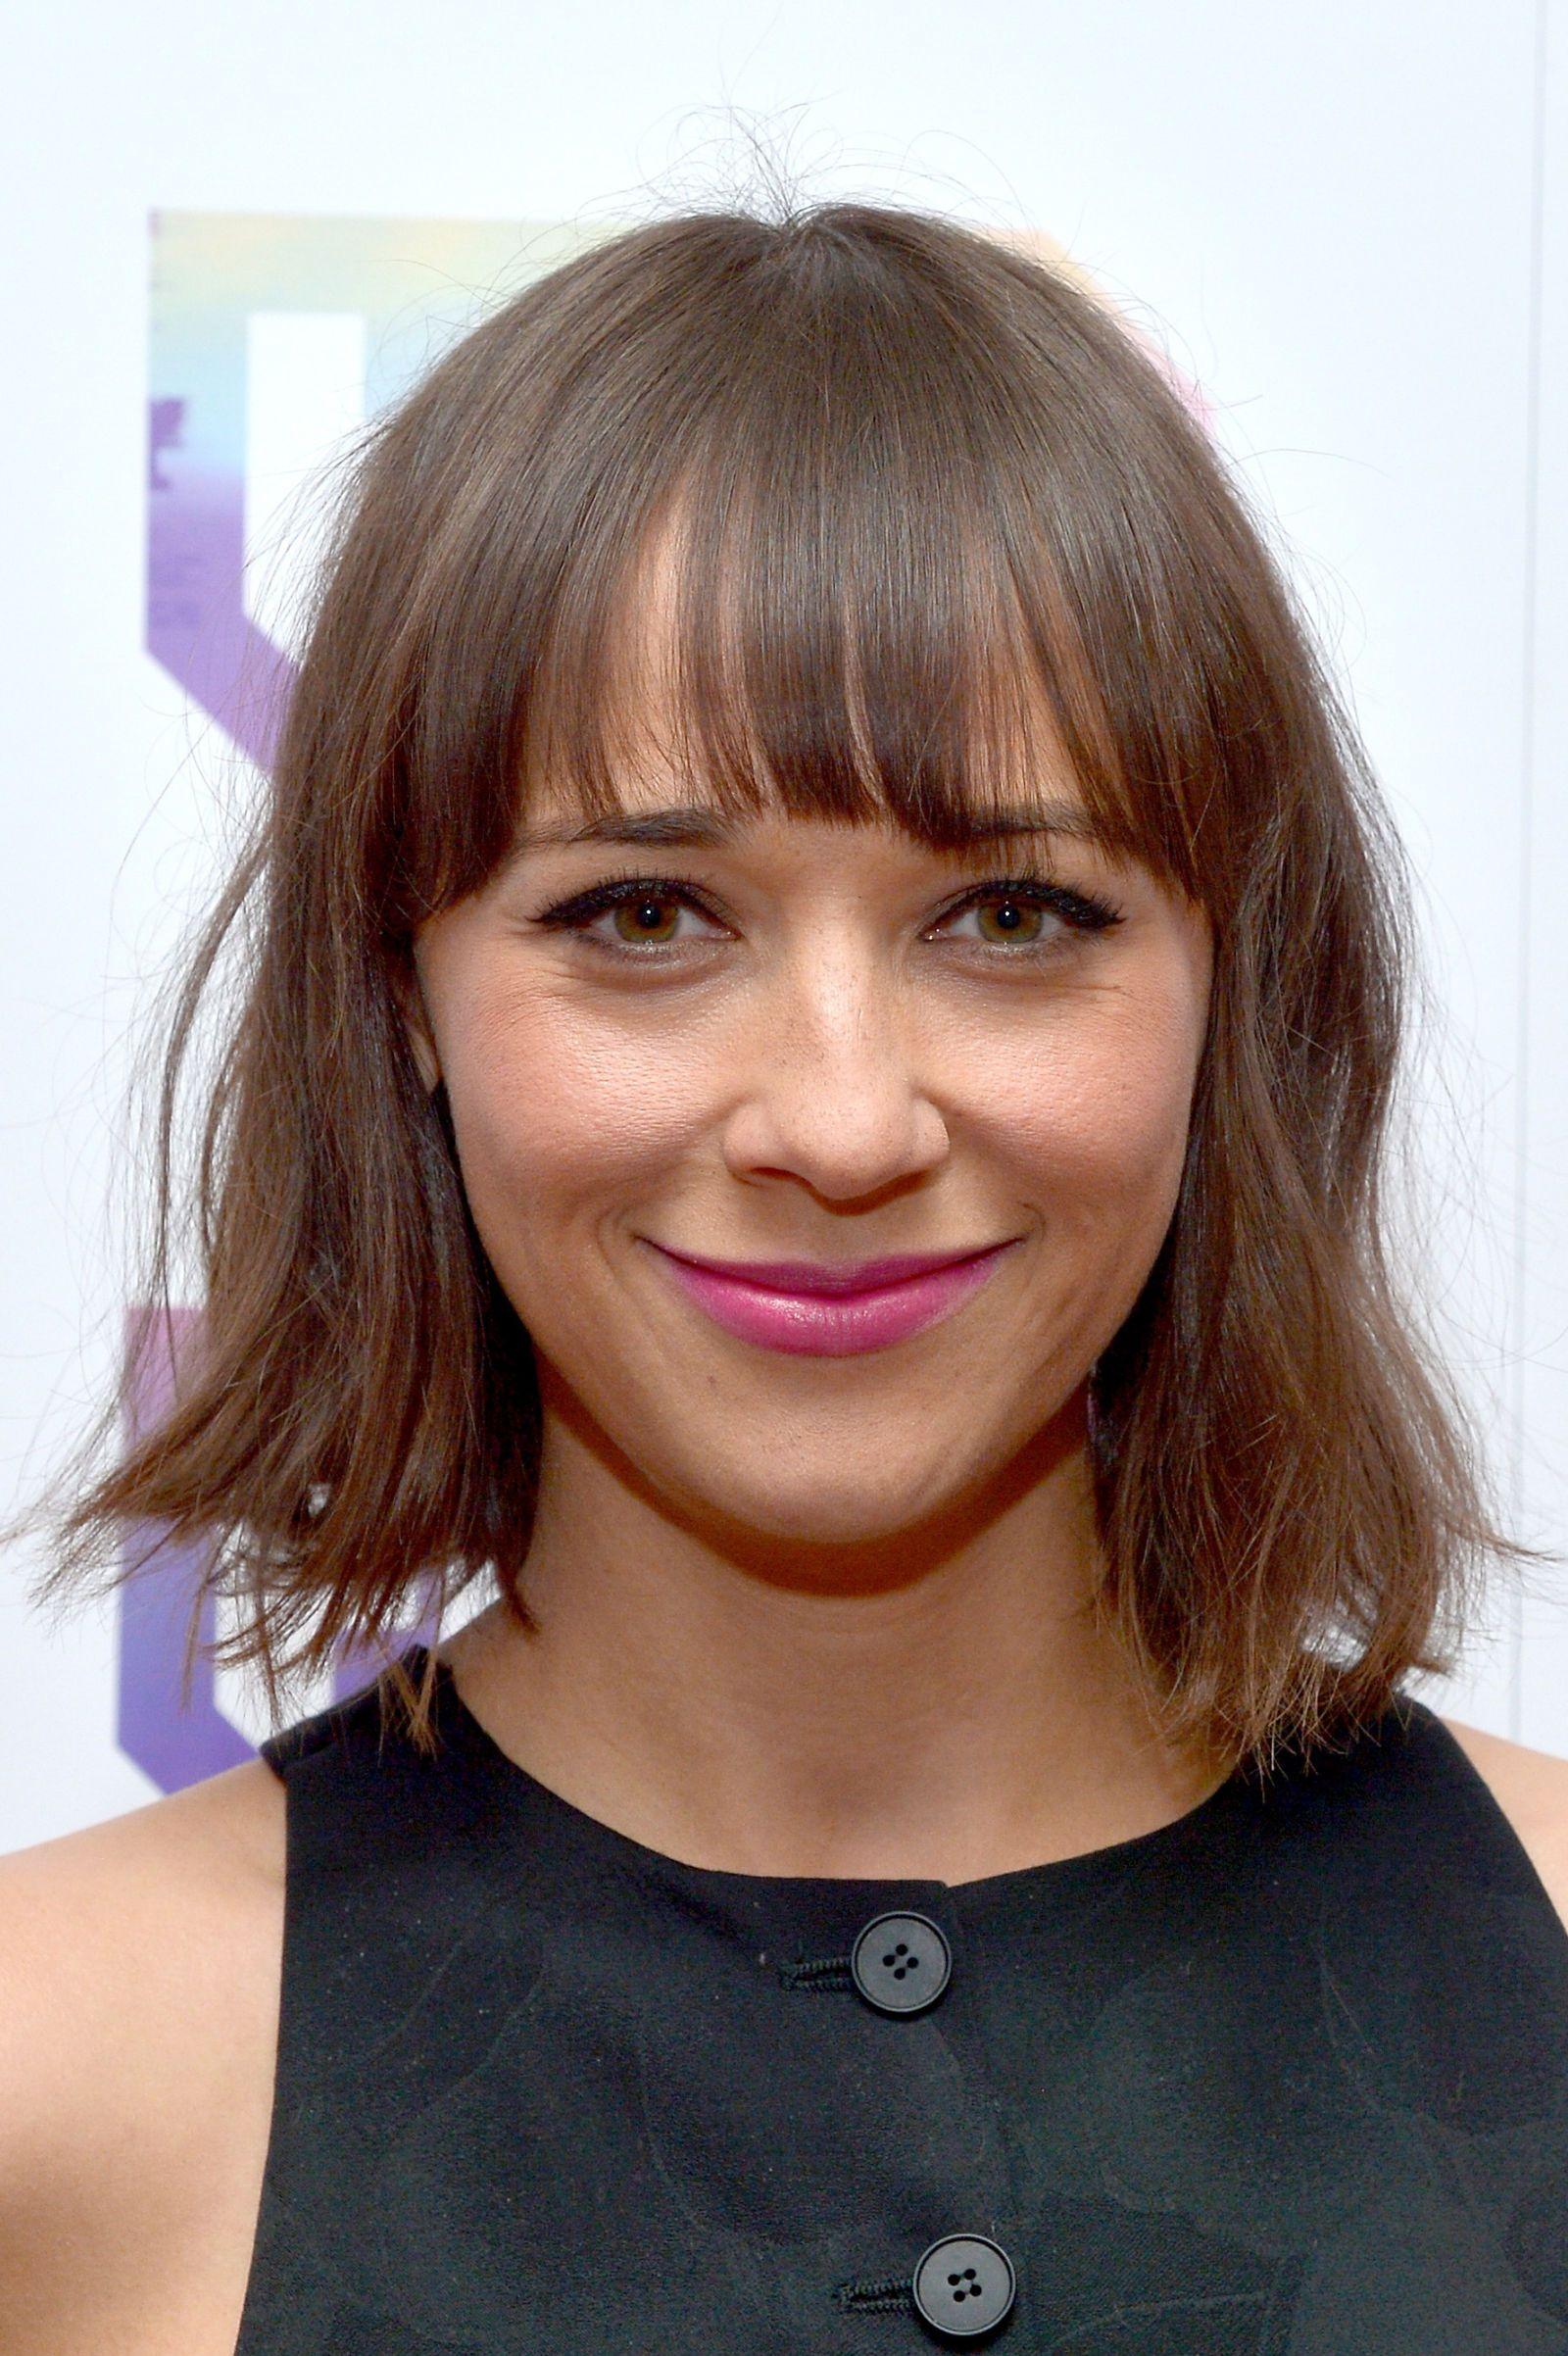 25 celebrity to inspire your next dye job